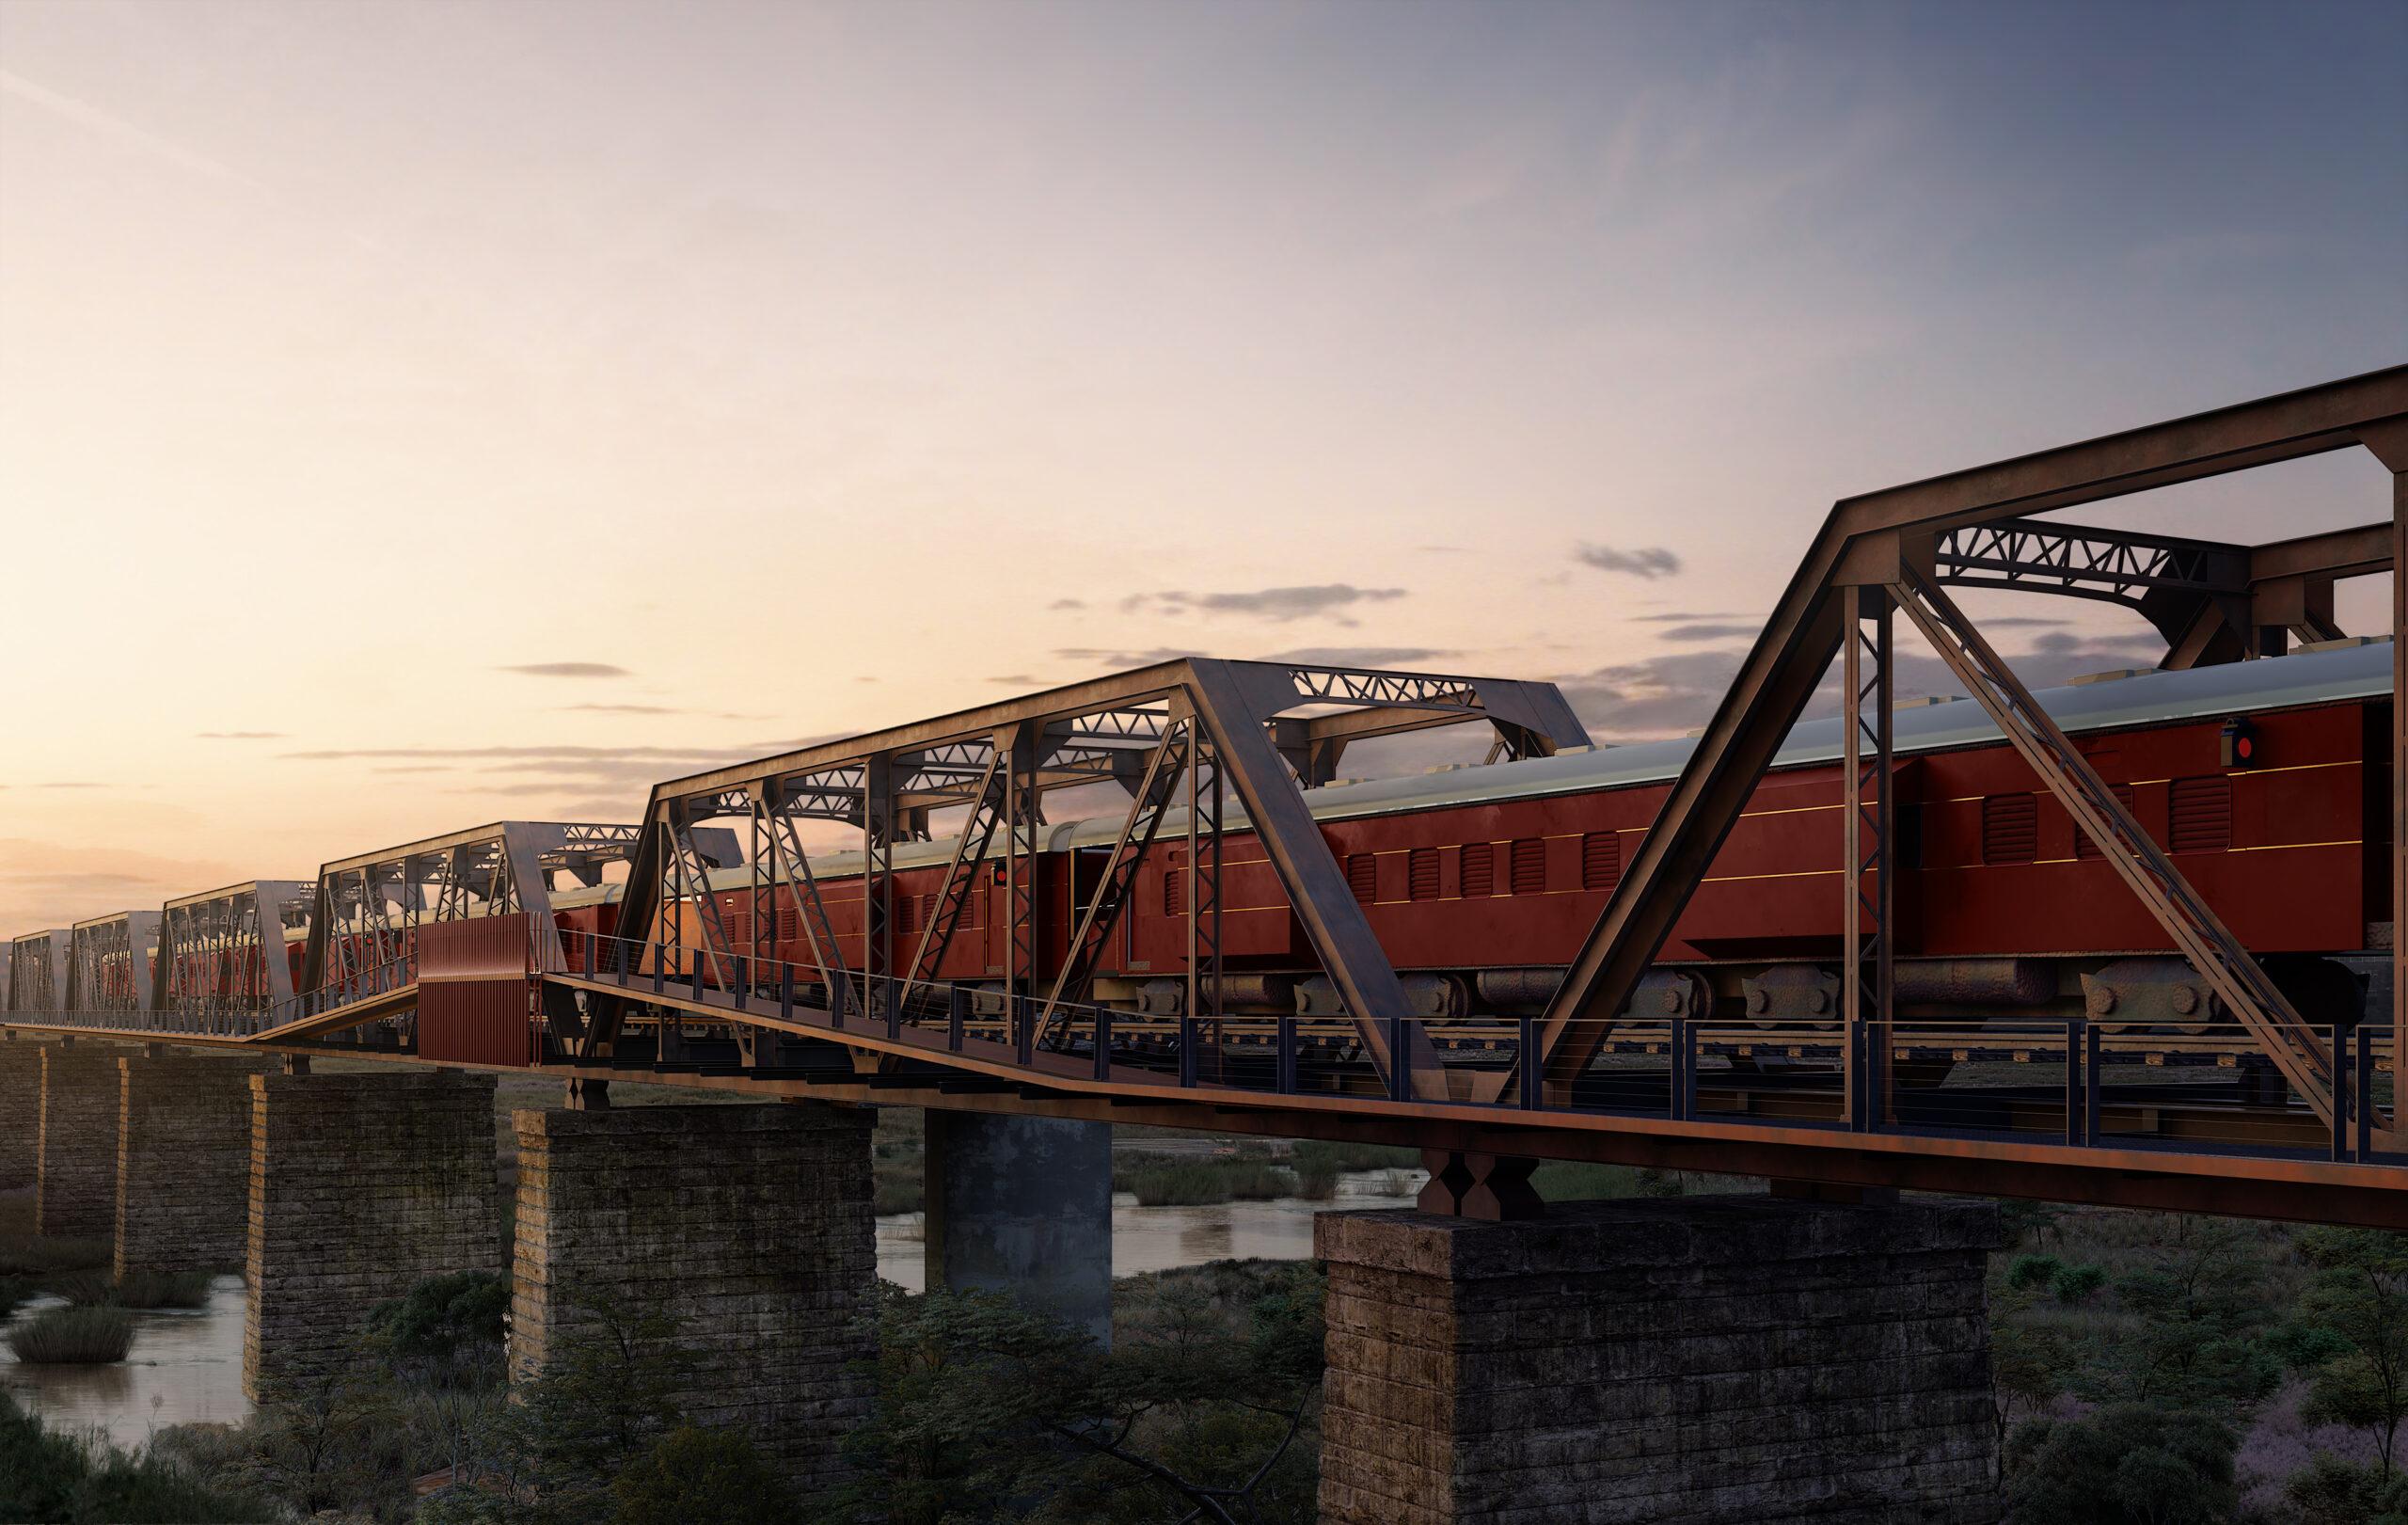 The Kruger Shalati Train on a Bridge hotel